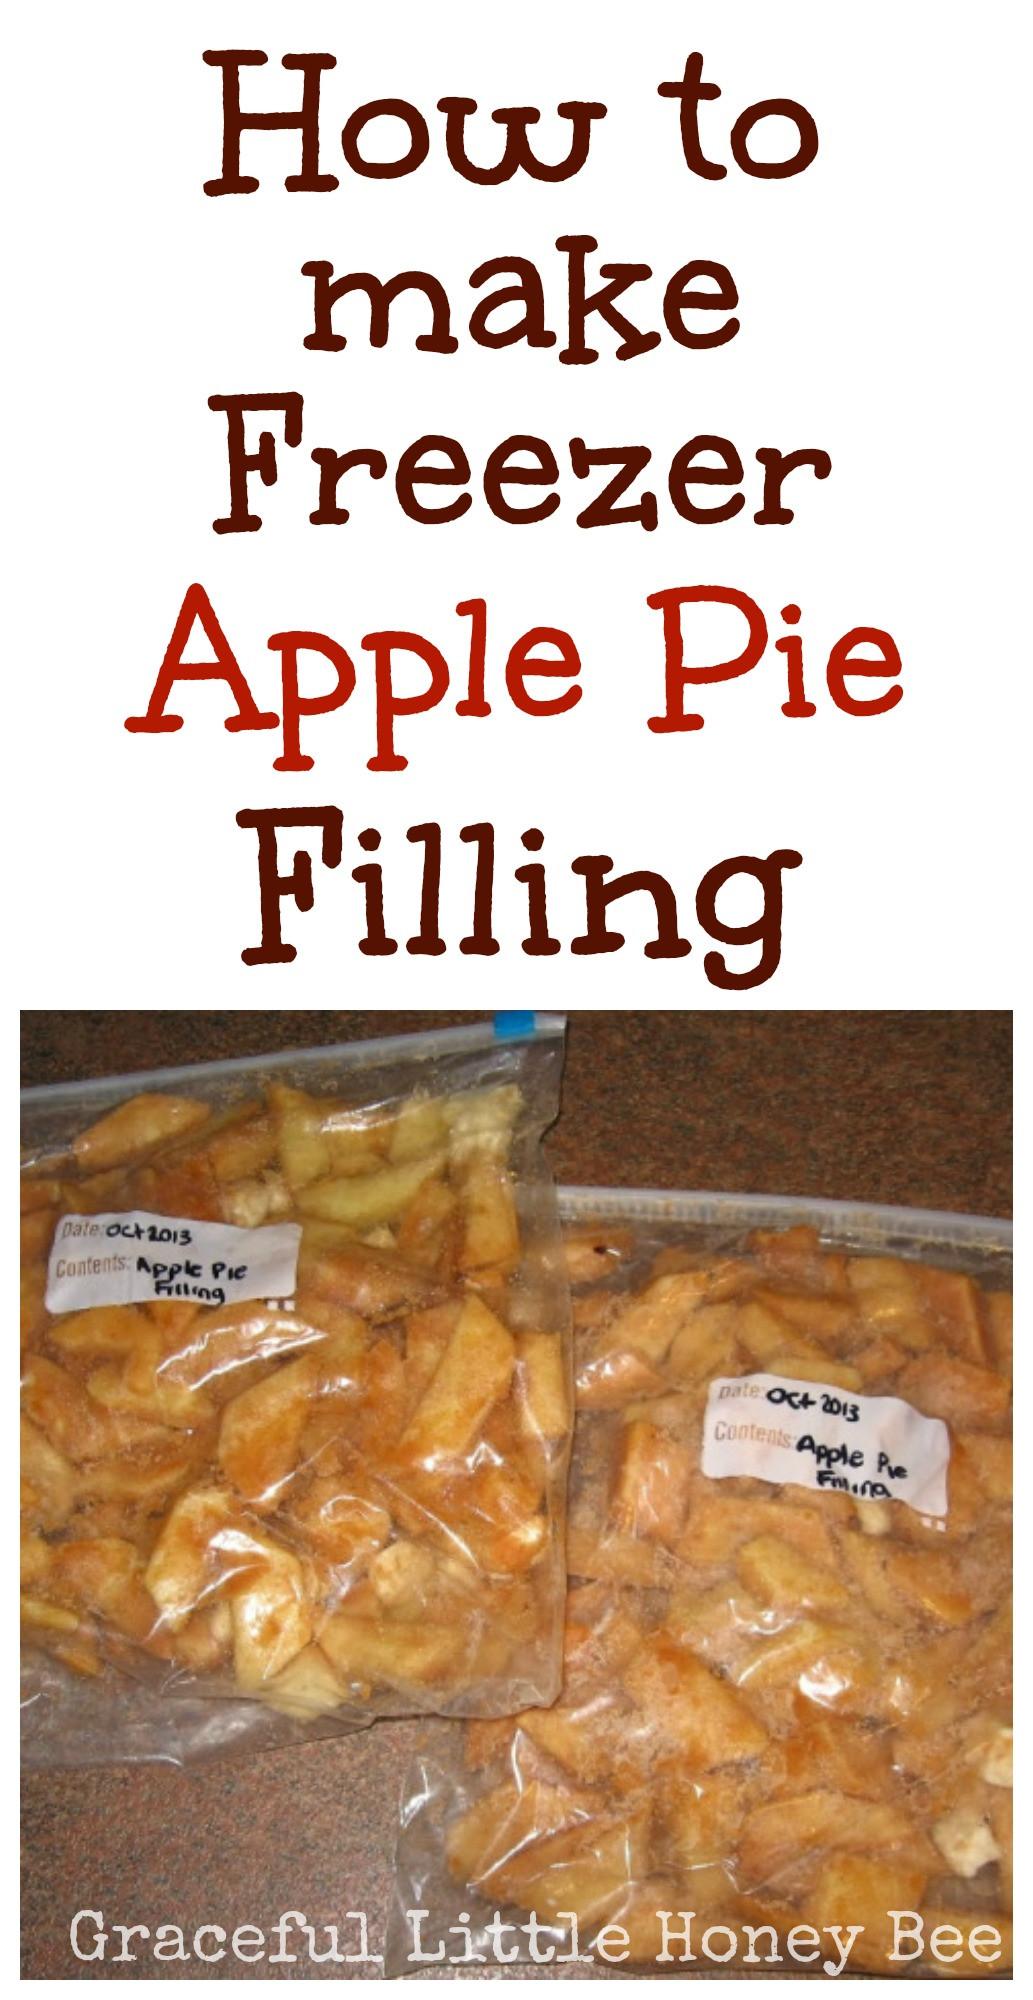 Organic Apple Pie Filling  Freezer Apple Pie Filling Video Tutorial Graceful